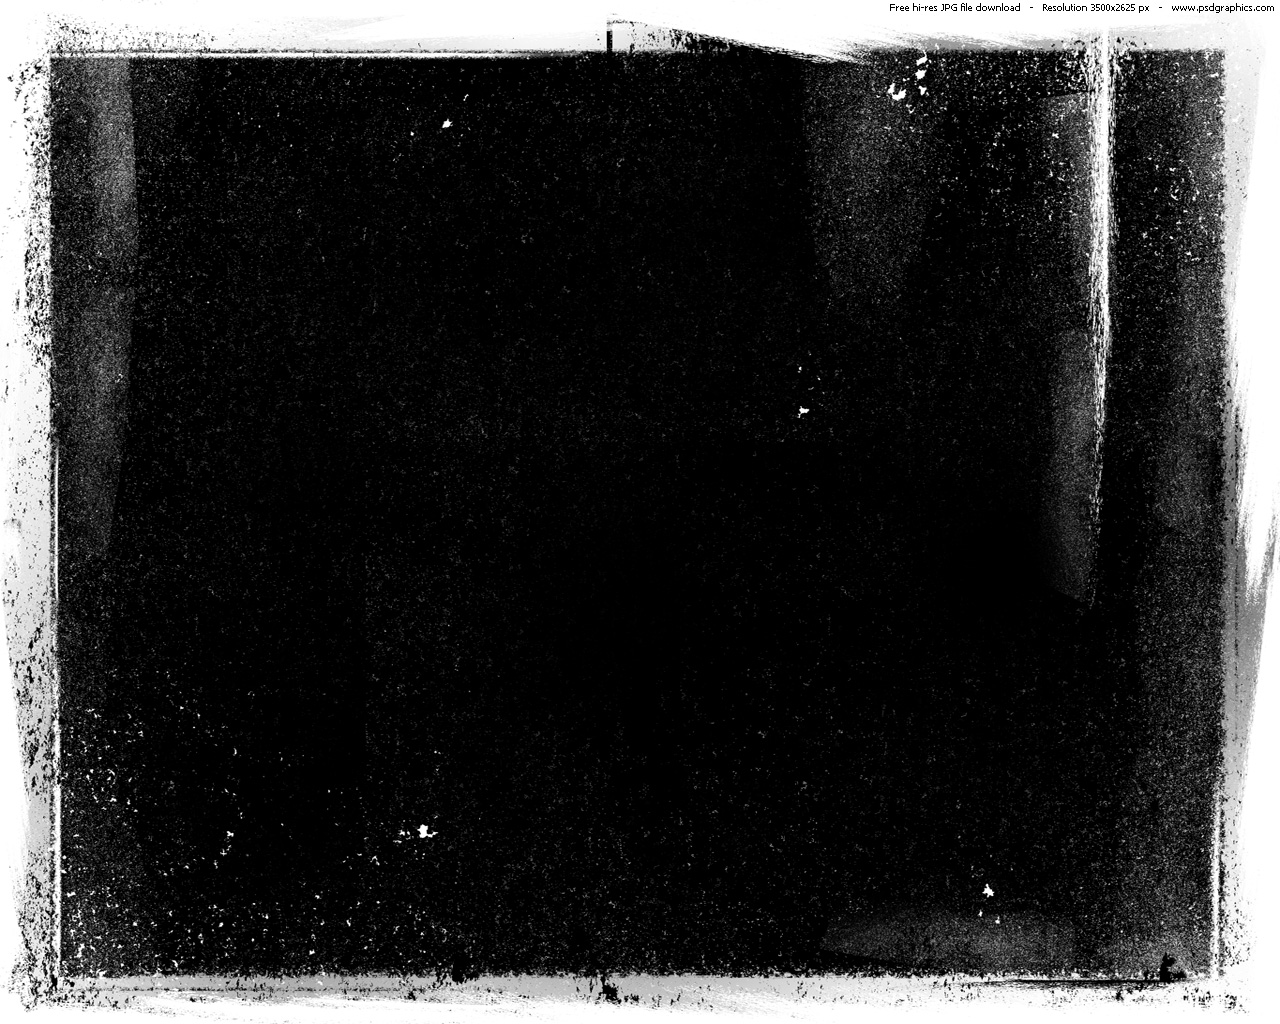 2009 wallpaper background black design 1280x1024